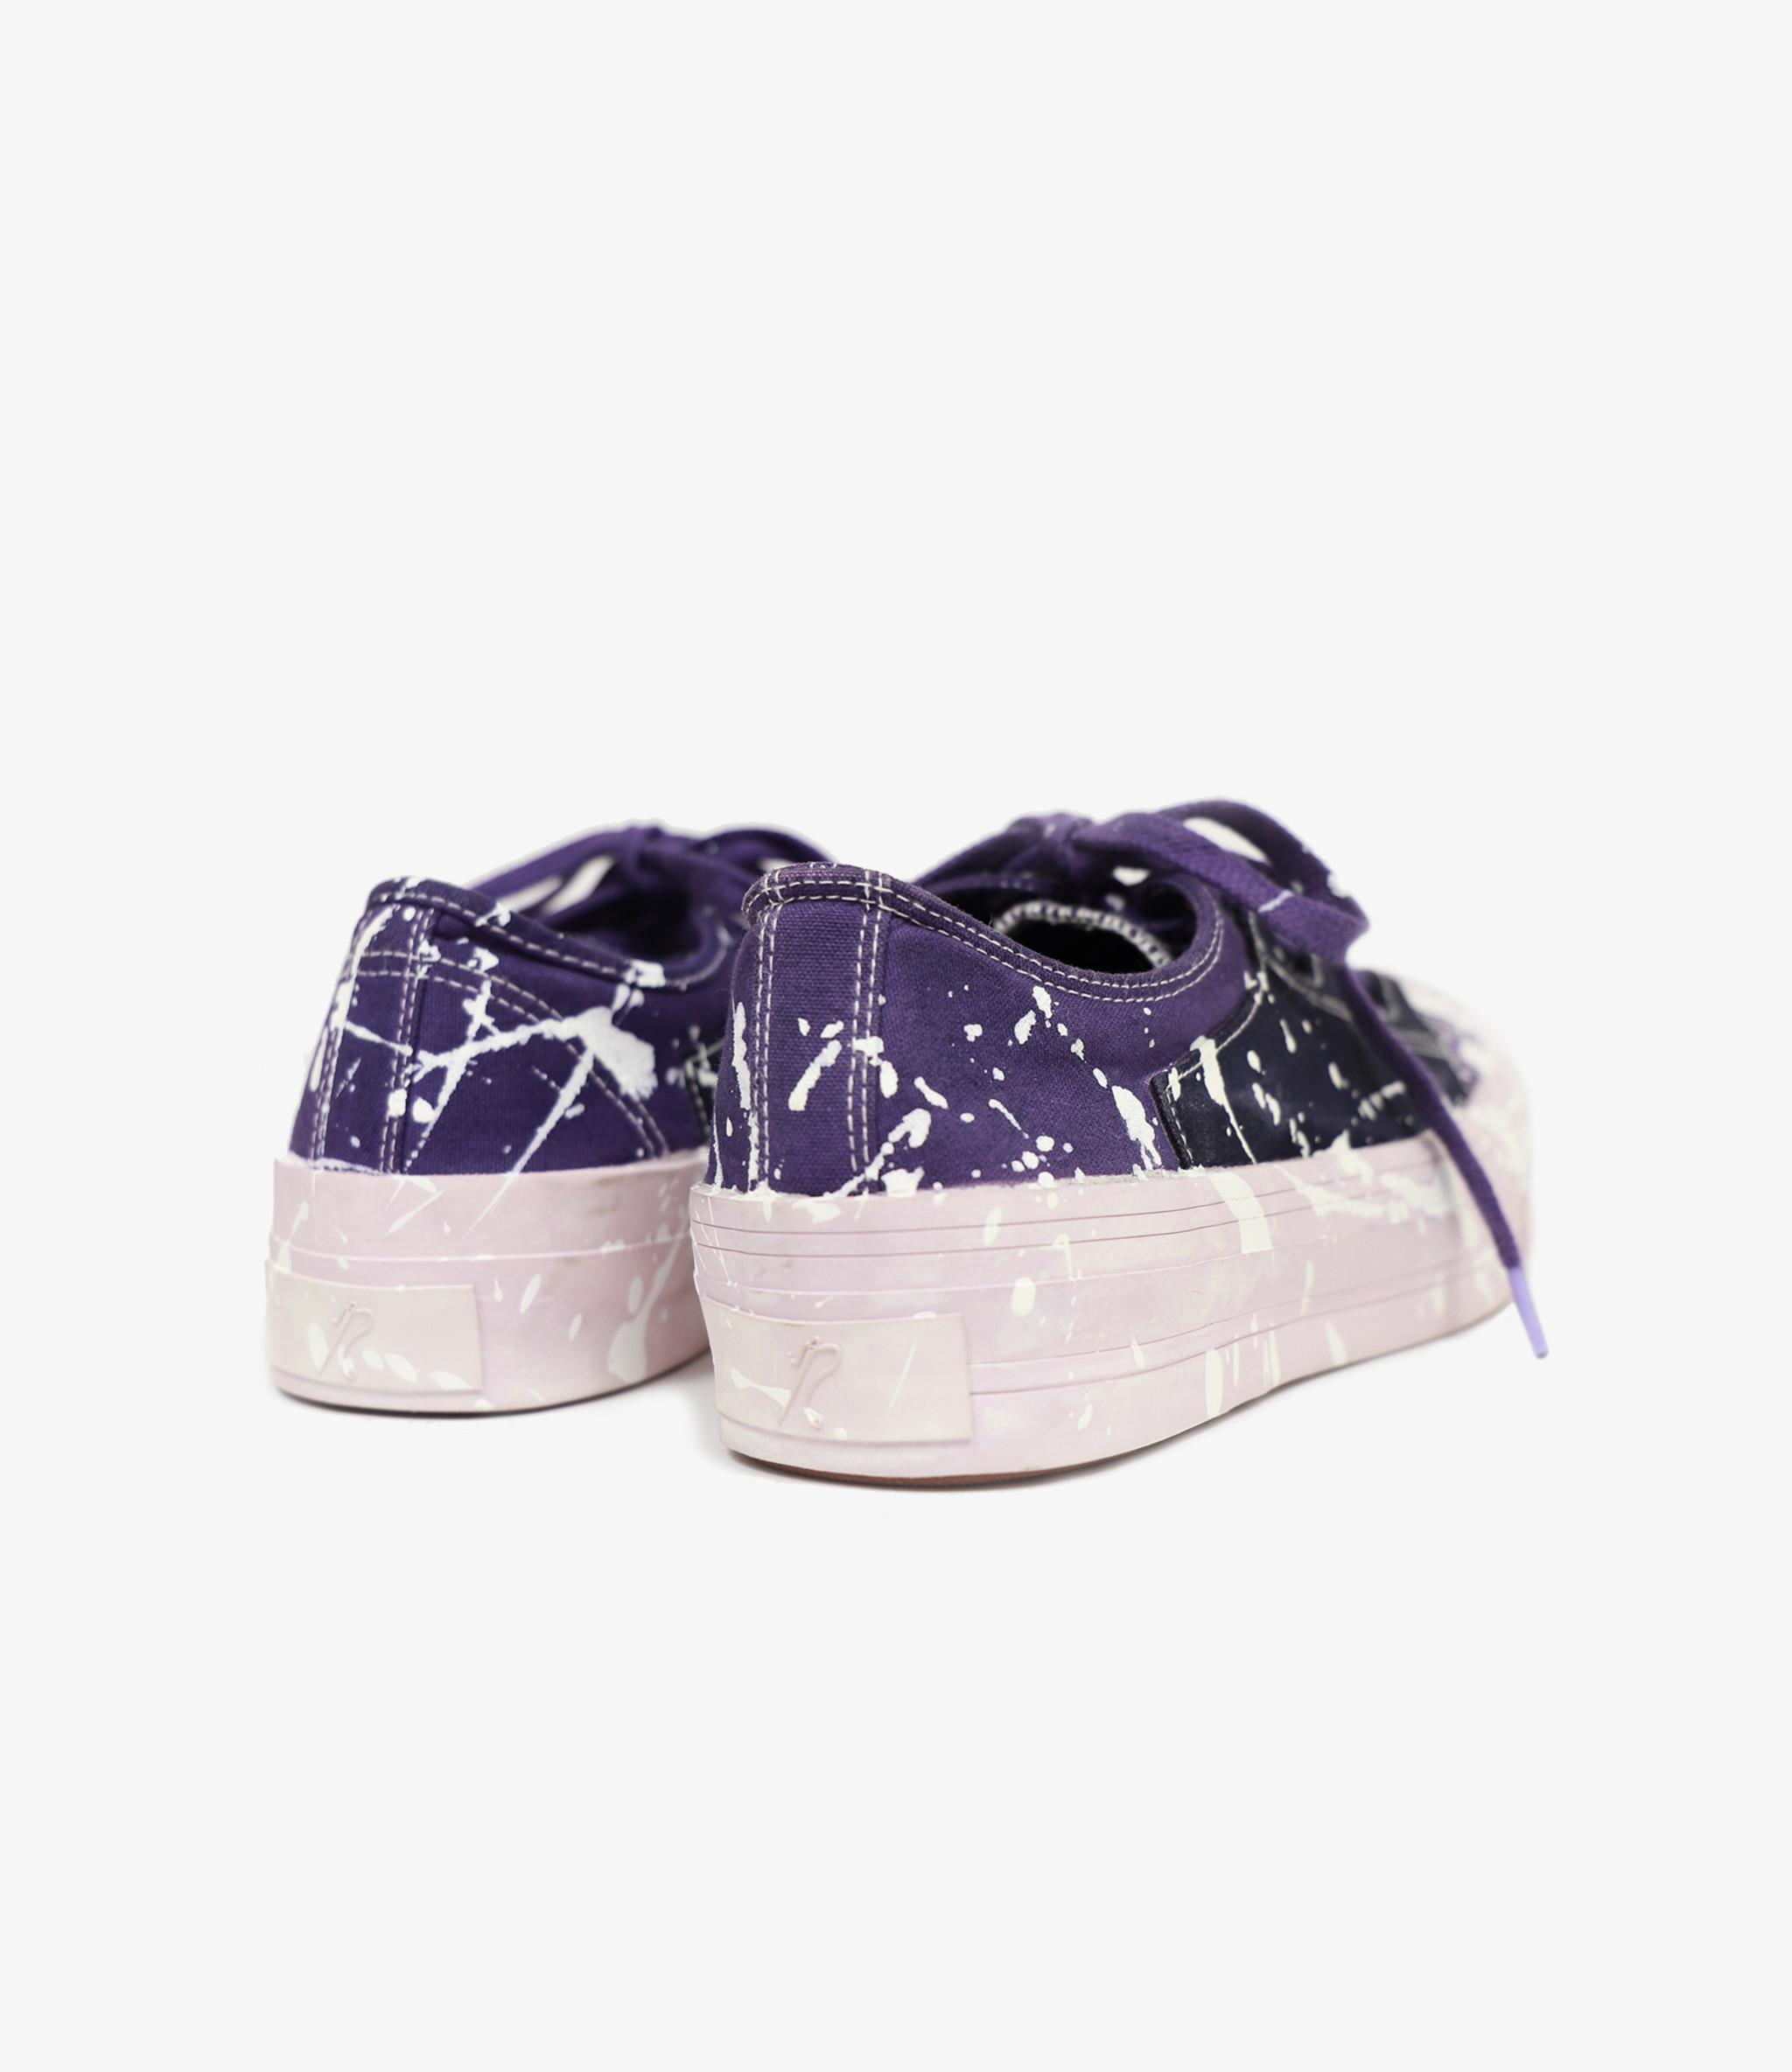 Needles Asymmetric Ghillie Sneaker - Ppl W/Wht Paint